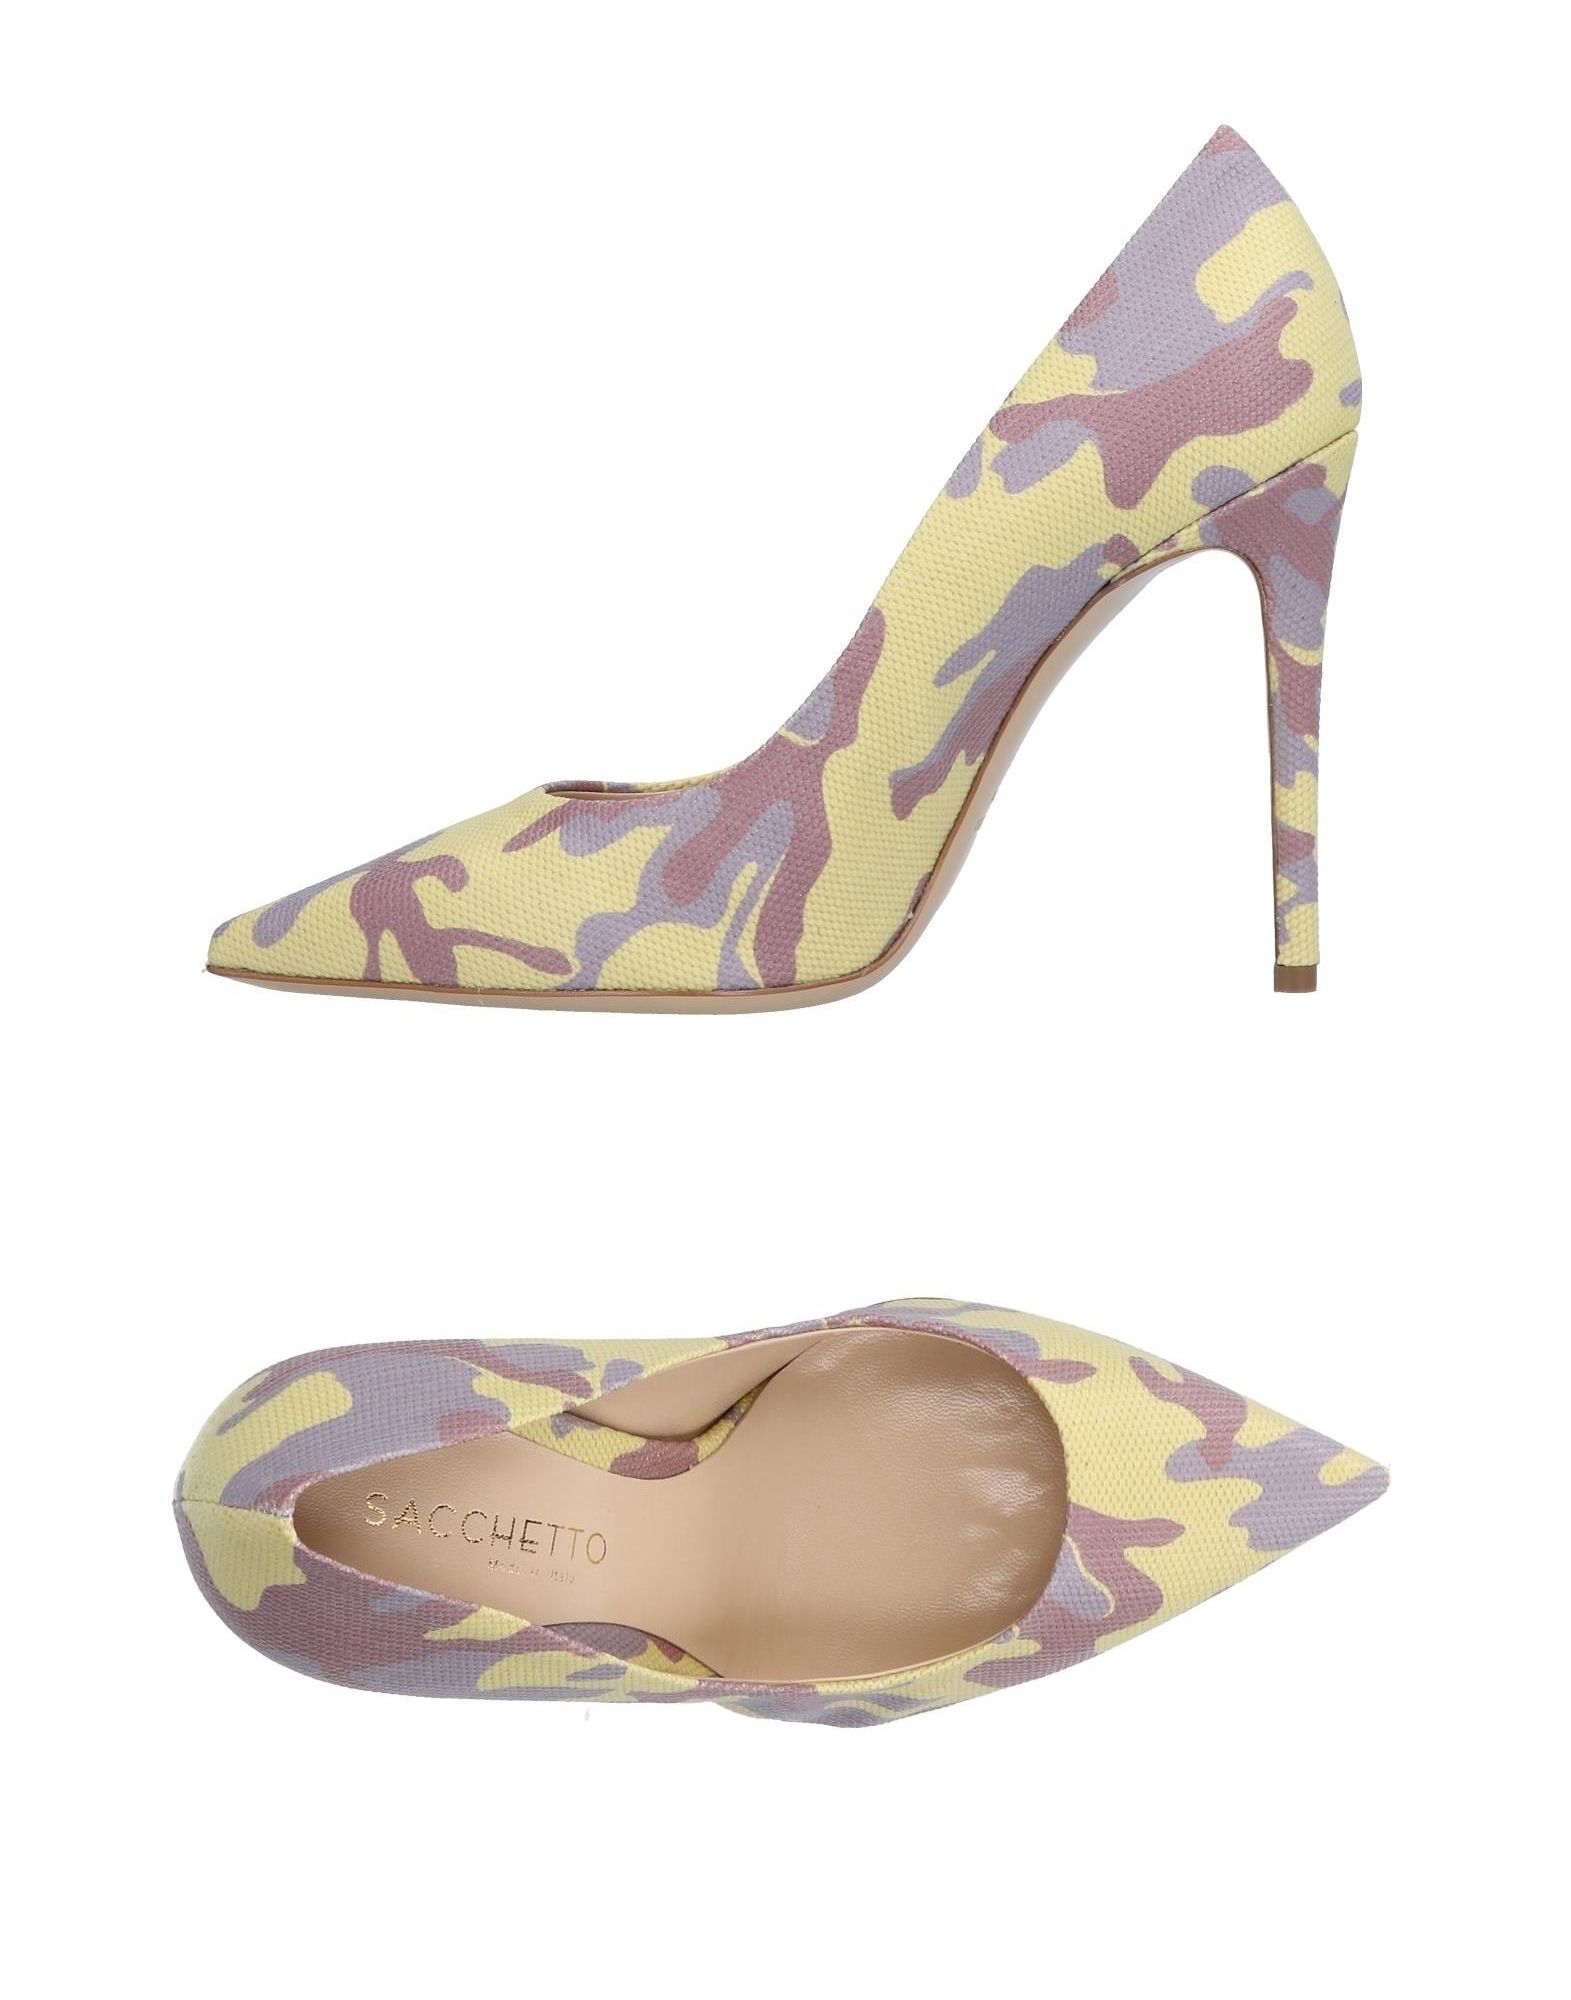 Sacchetto Pumps Damen  11483943FR Gute Qualität beliebte Schuhe